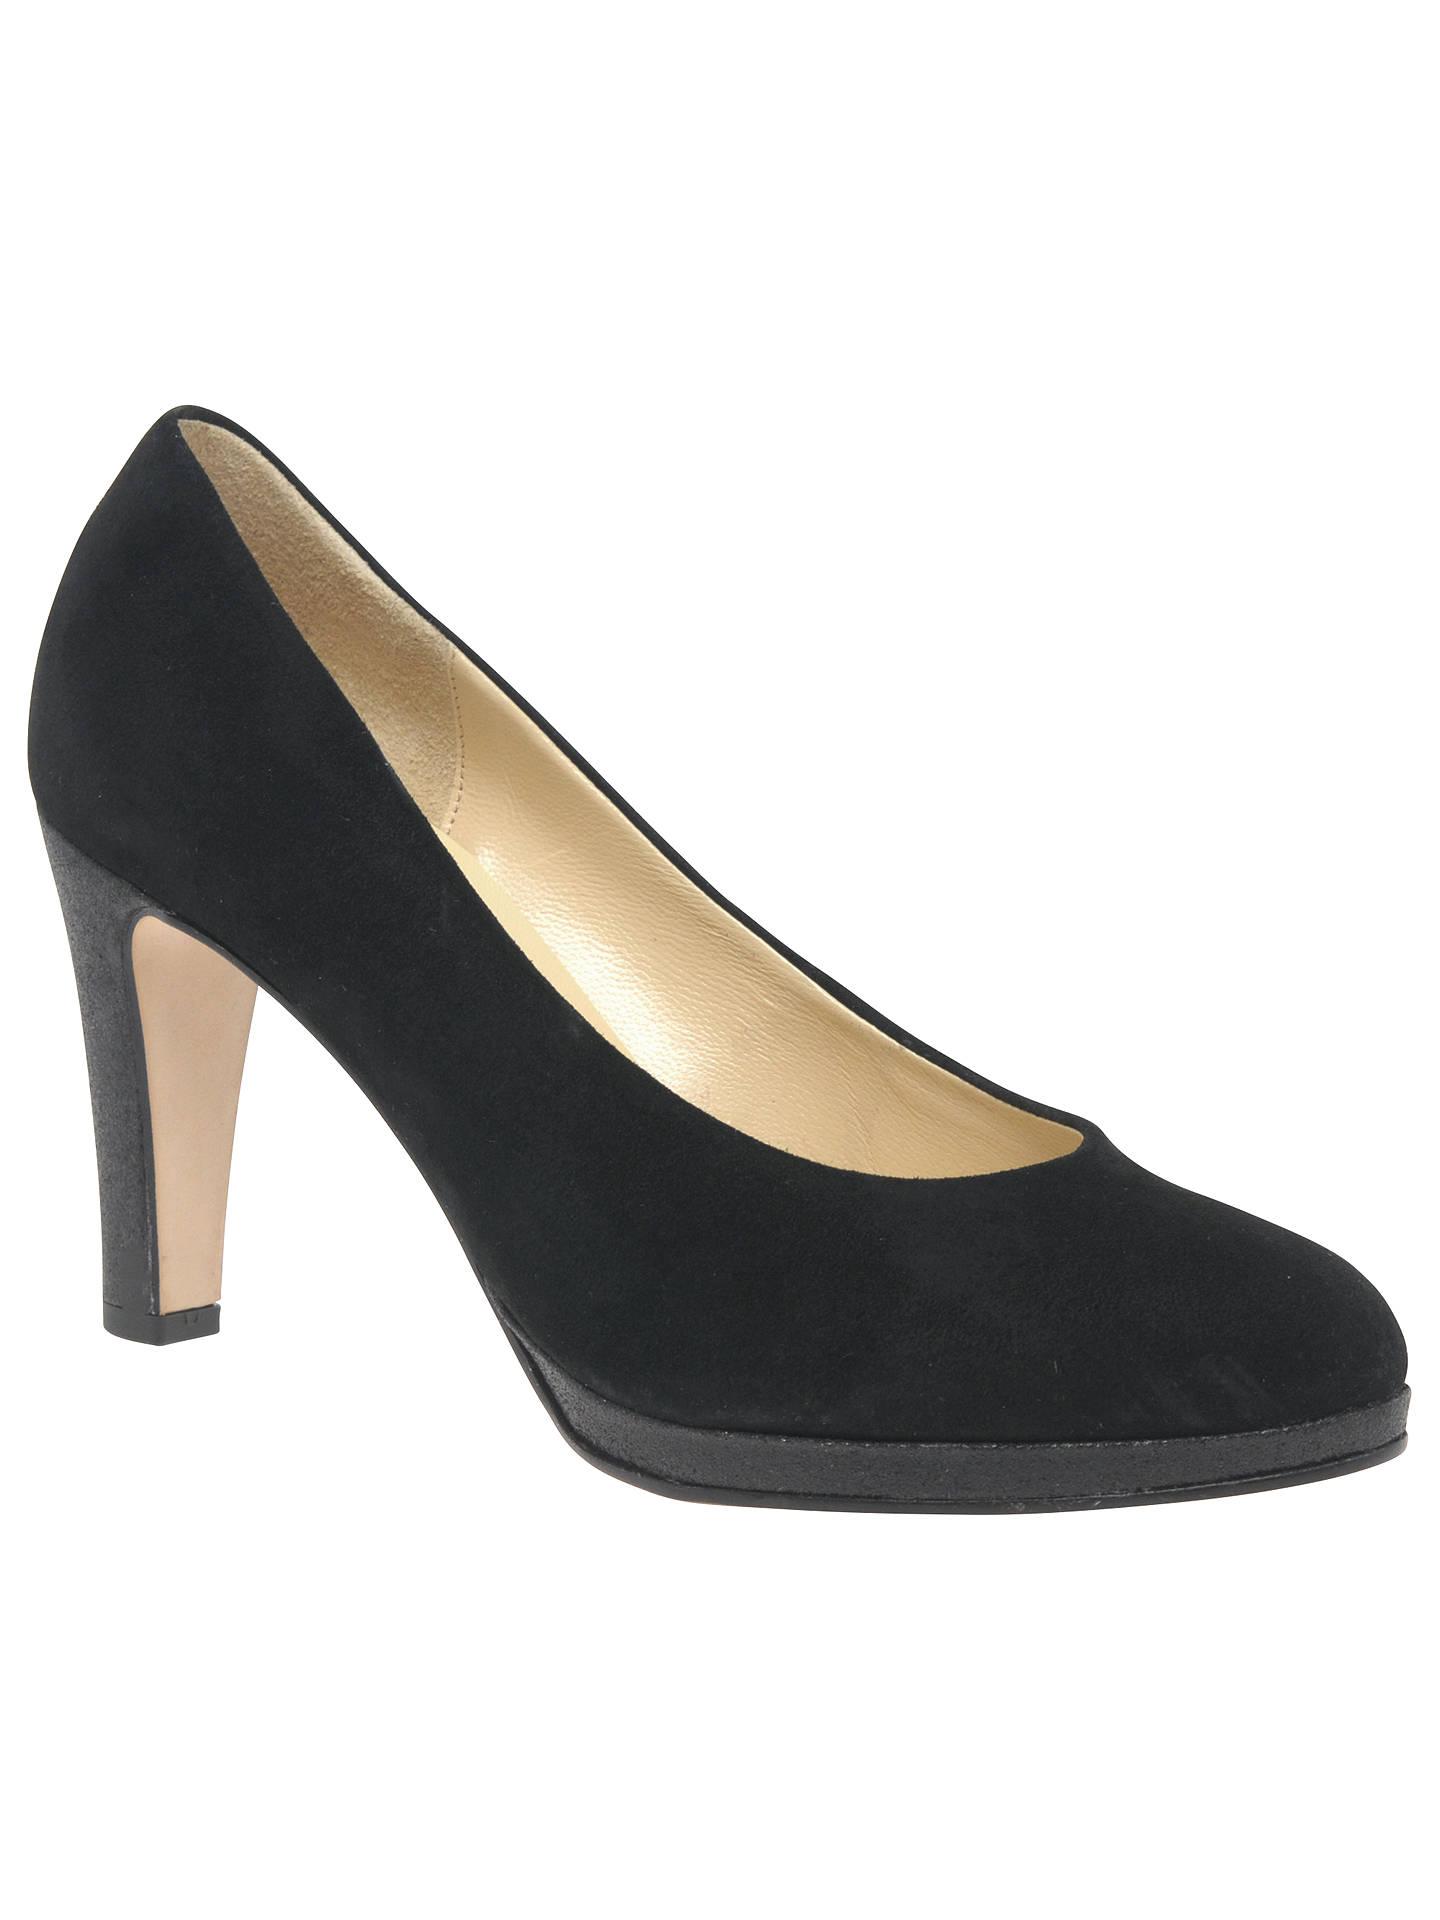 Gabor Splendid Black Suede Shoes